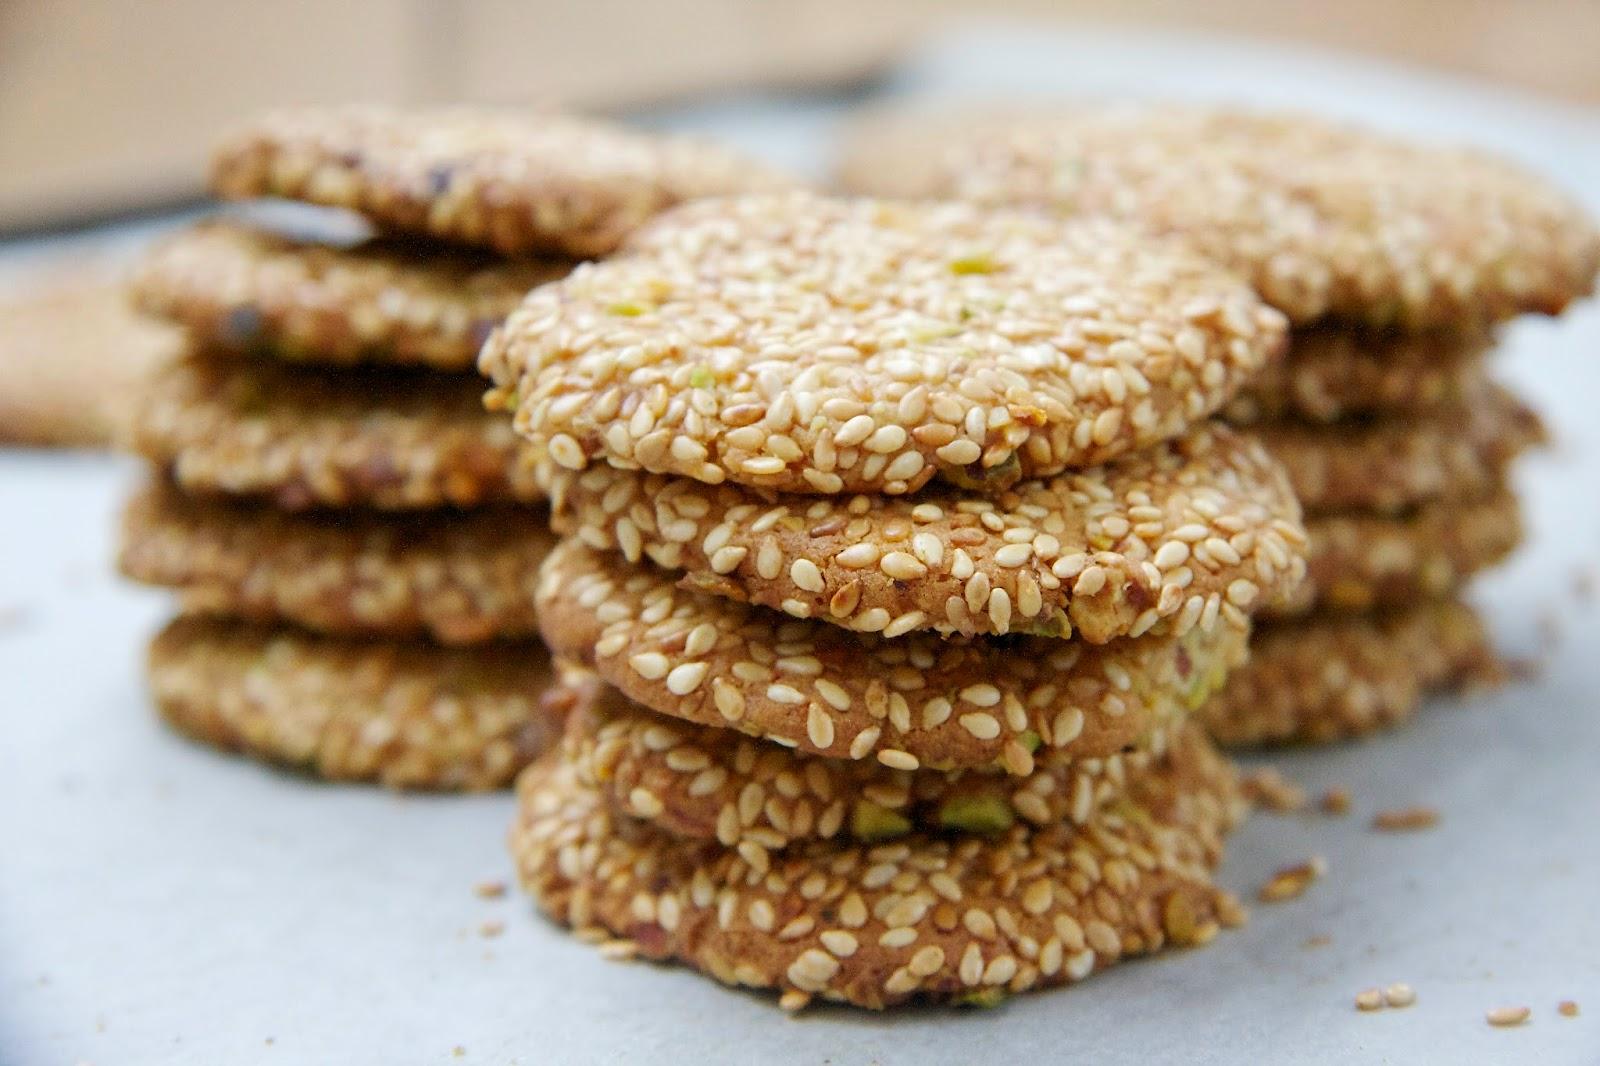 Italian sesame seed cookie recipes